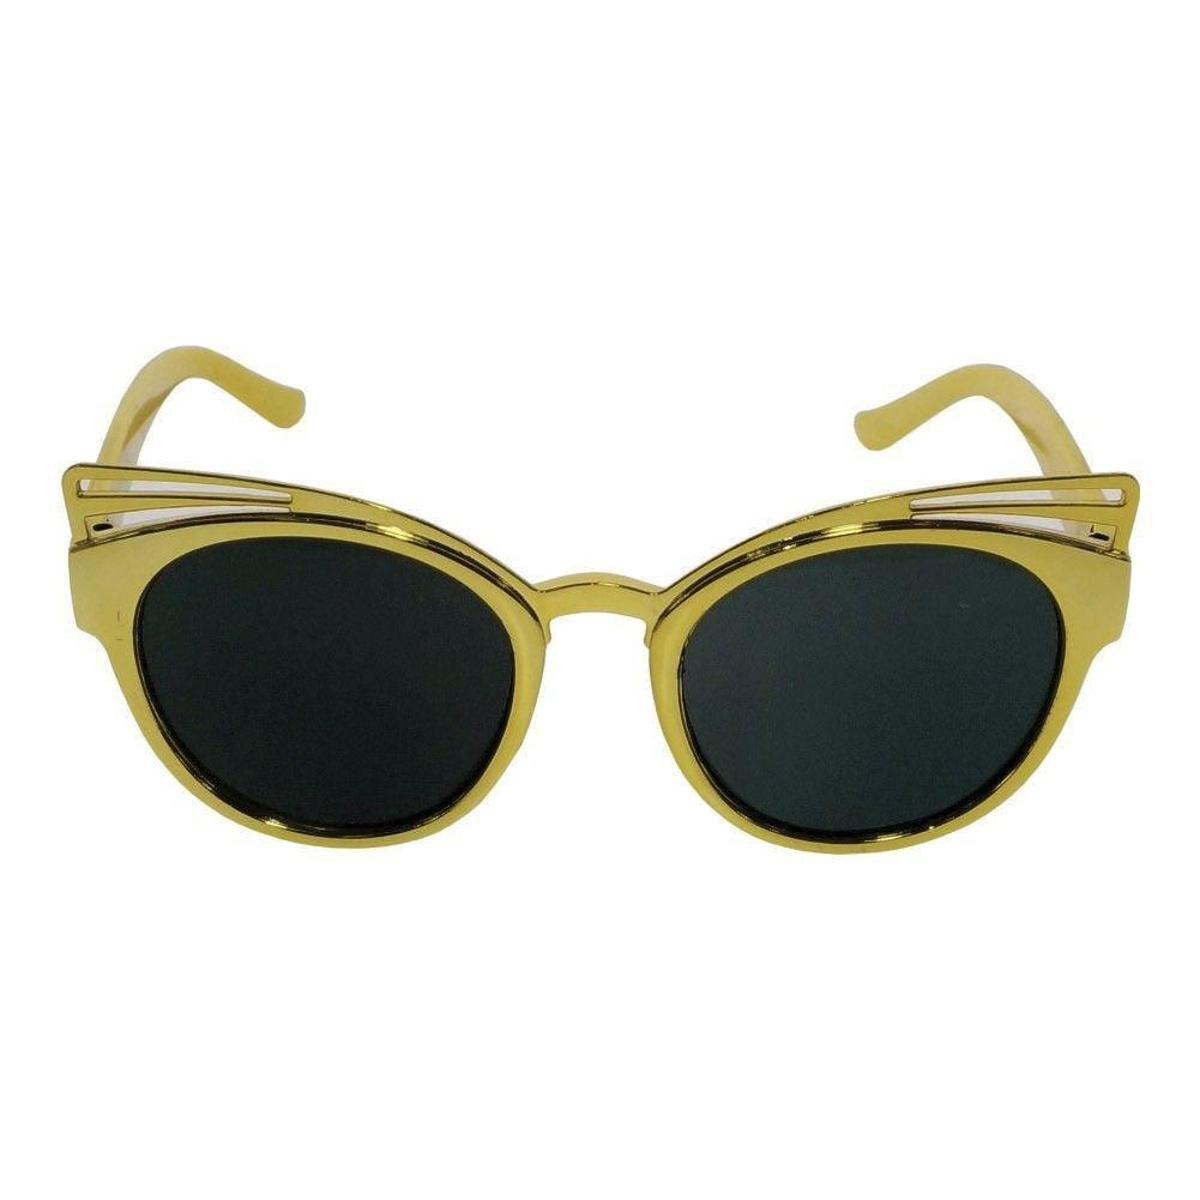 Óculos de Sol Khatto Infantil Fashion Feminino - Compre Agora   Netshoes 8127c435bf